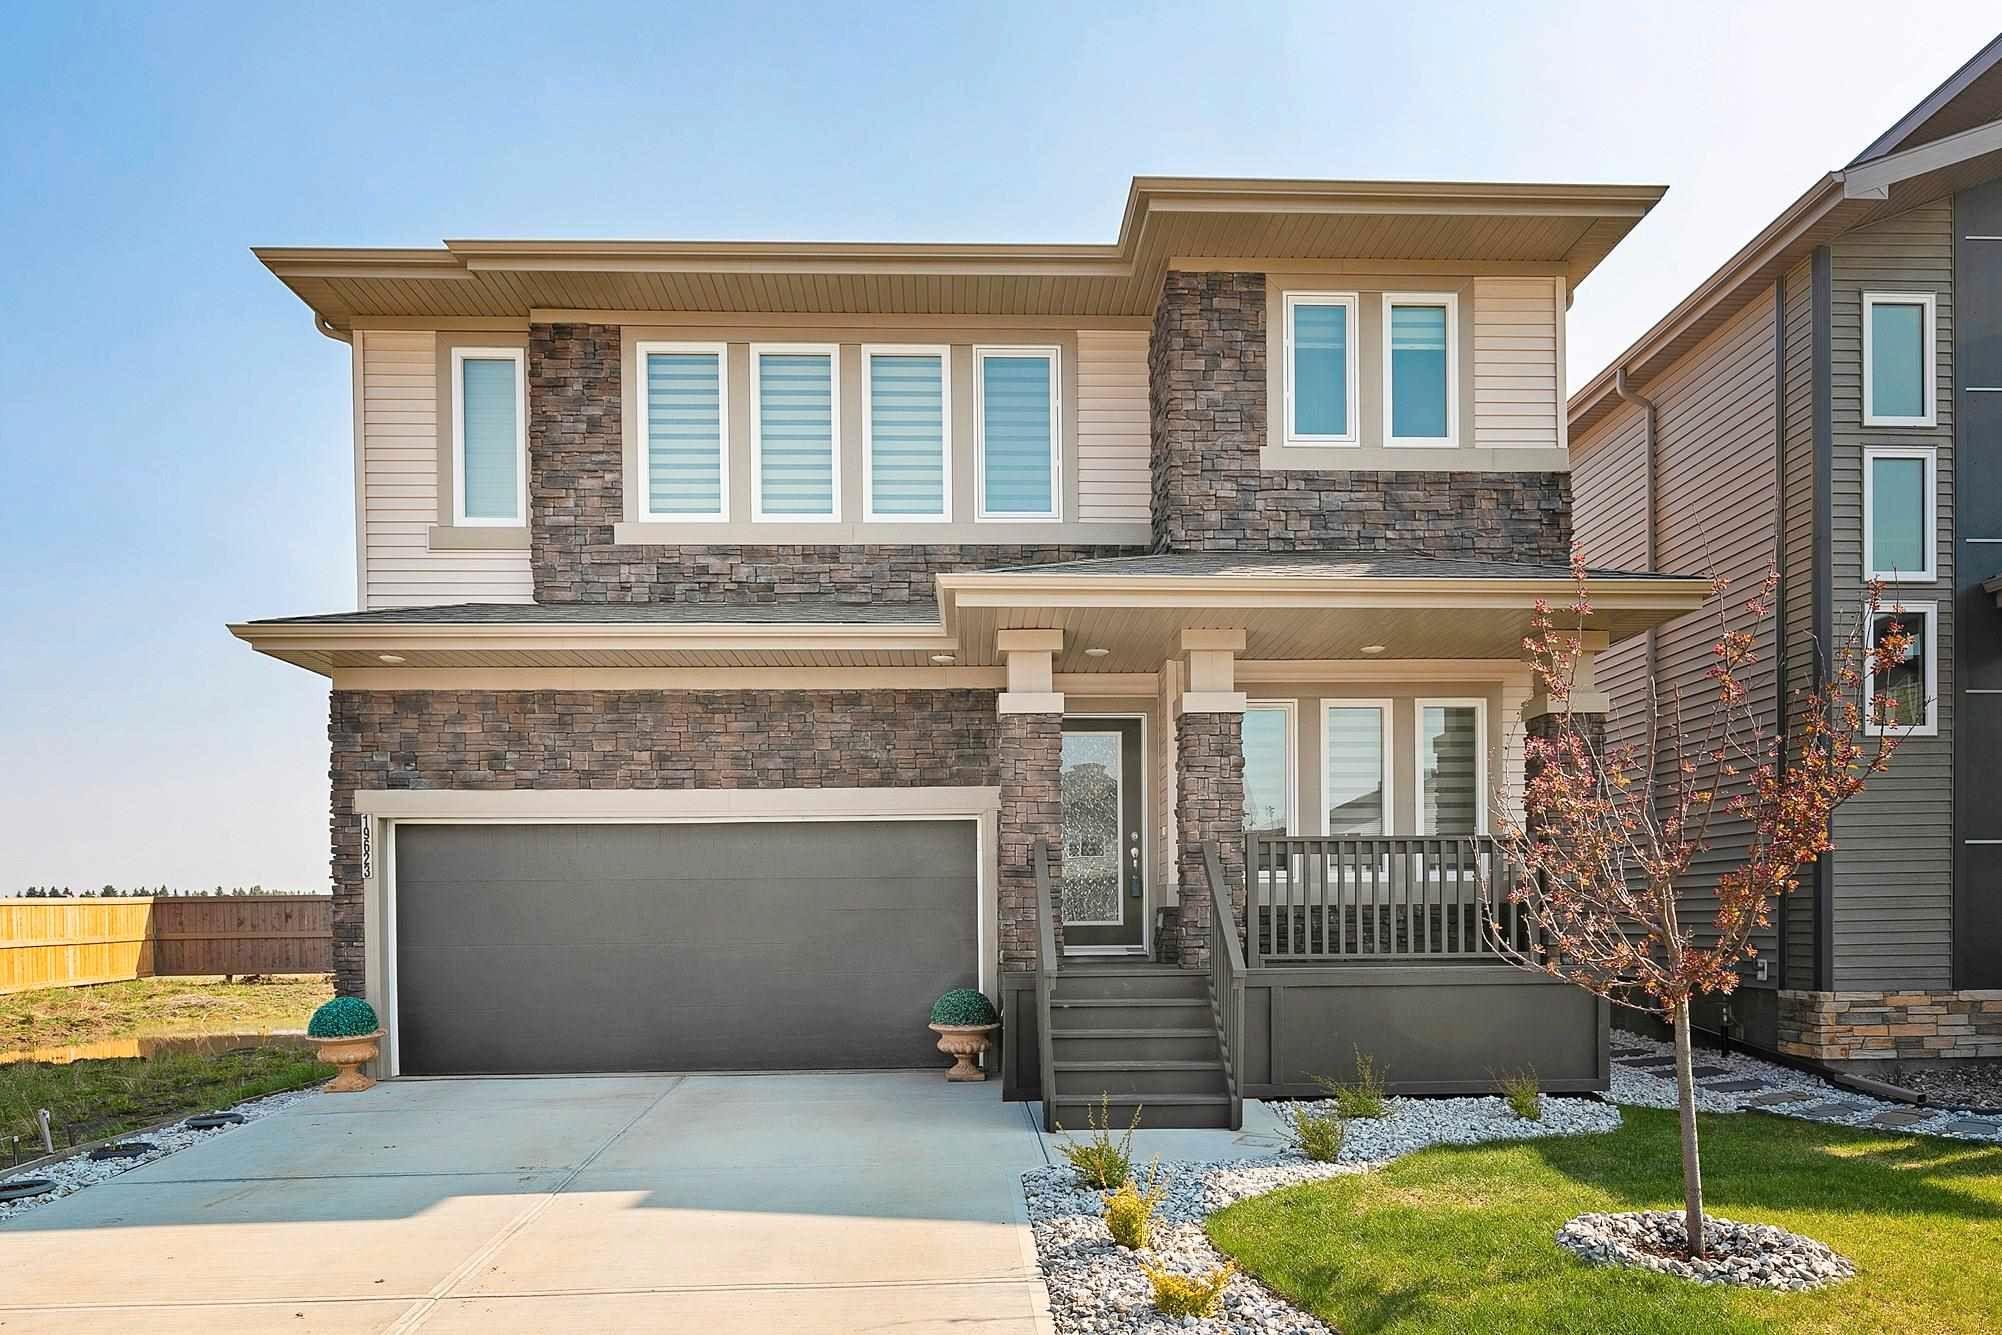 Main Photo: 19623 26 Avenue in Edmonton: Zone 57 House for sale : MLS®# E4246587